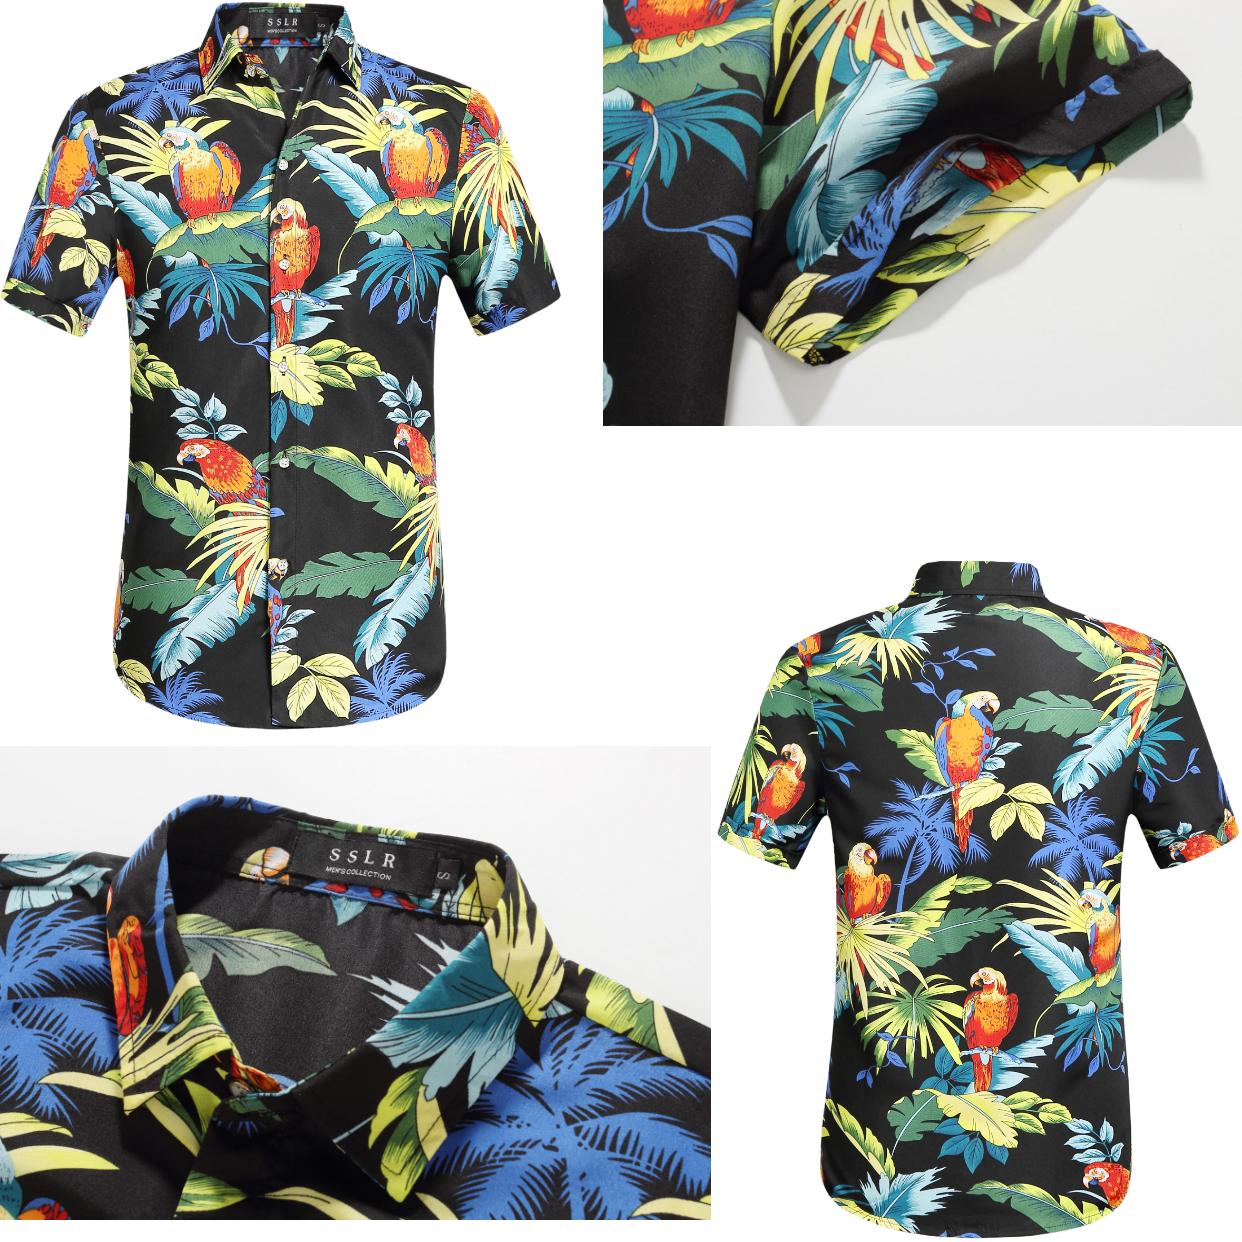 208a7dbc SSLR Men's Parrots Leaves Button Down Casual Short Sleeve Hawaiian Shirt #hawaiian  shirt #parrots and leaves